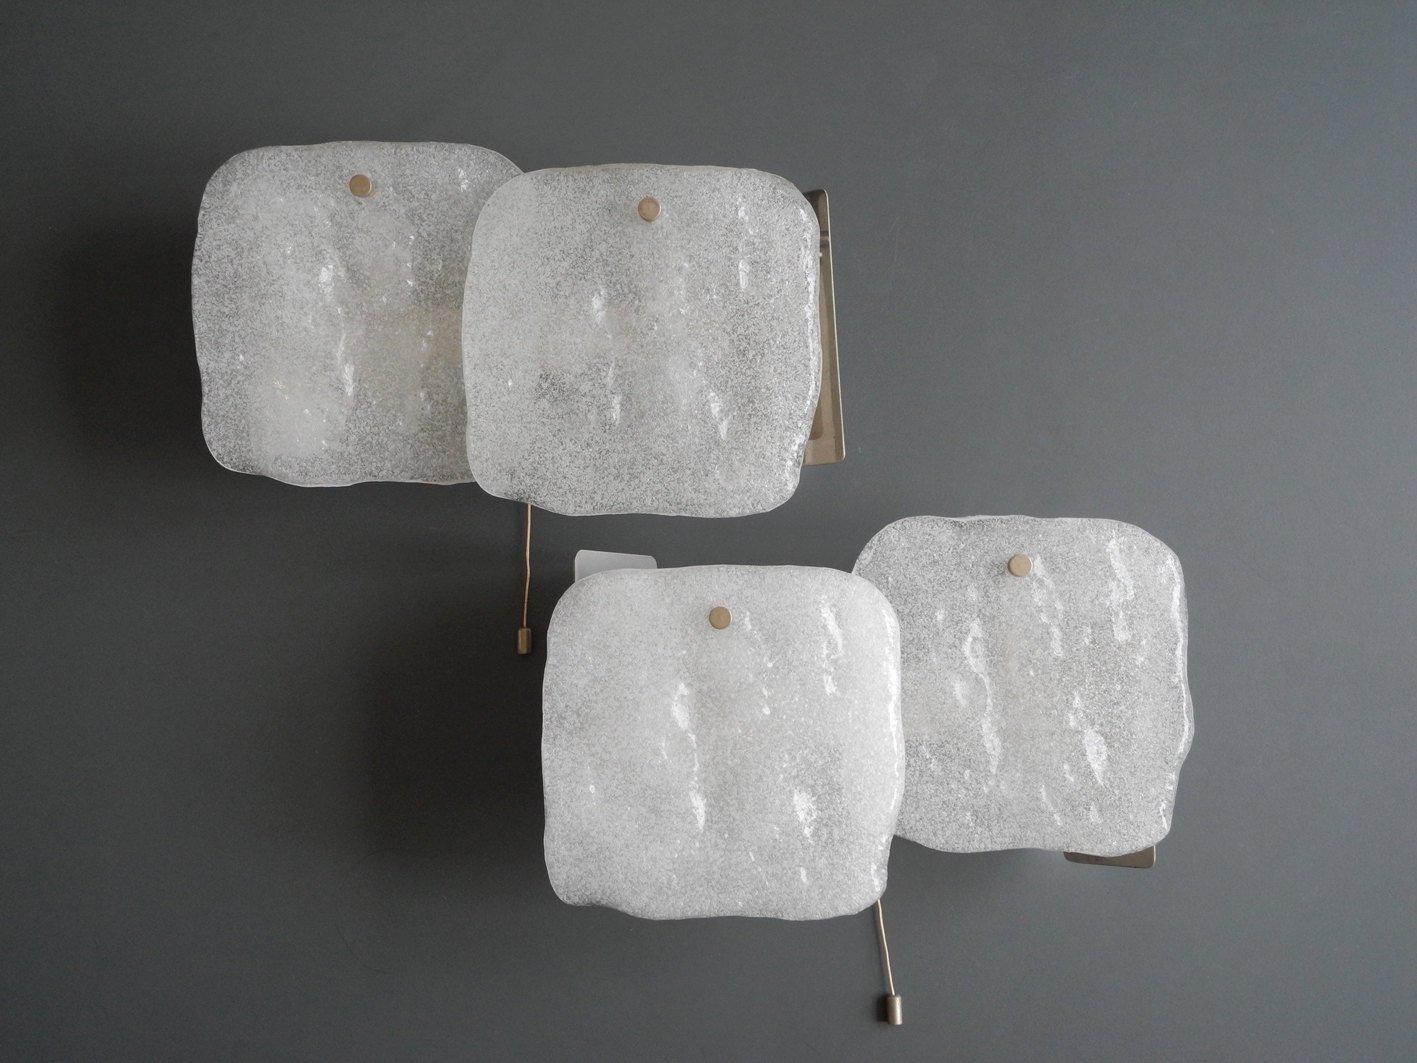 frosted glass sconces by jt kalmar for kalmar set of  for sale  - frosted glass sconces by jt kalmar for kalmar set of  for sale at pamono